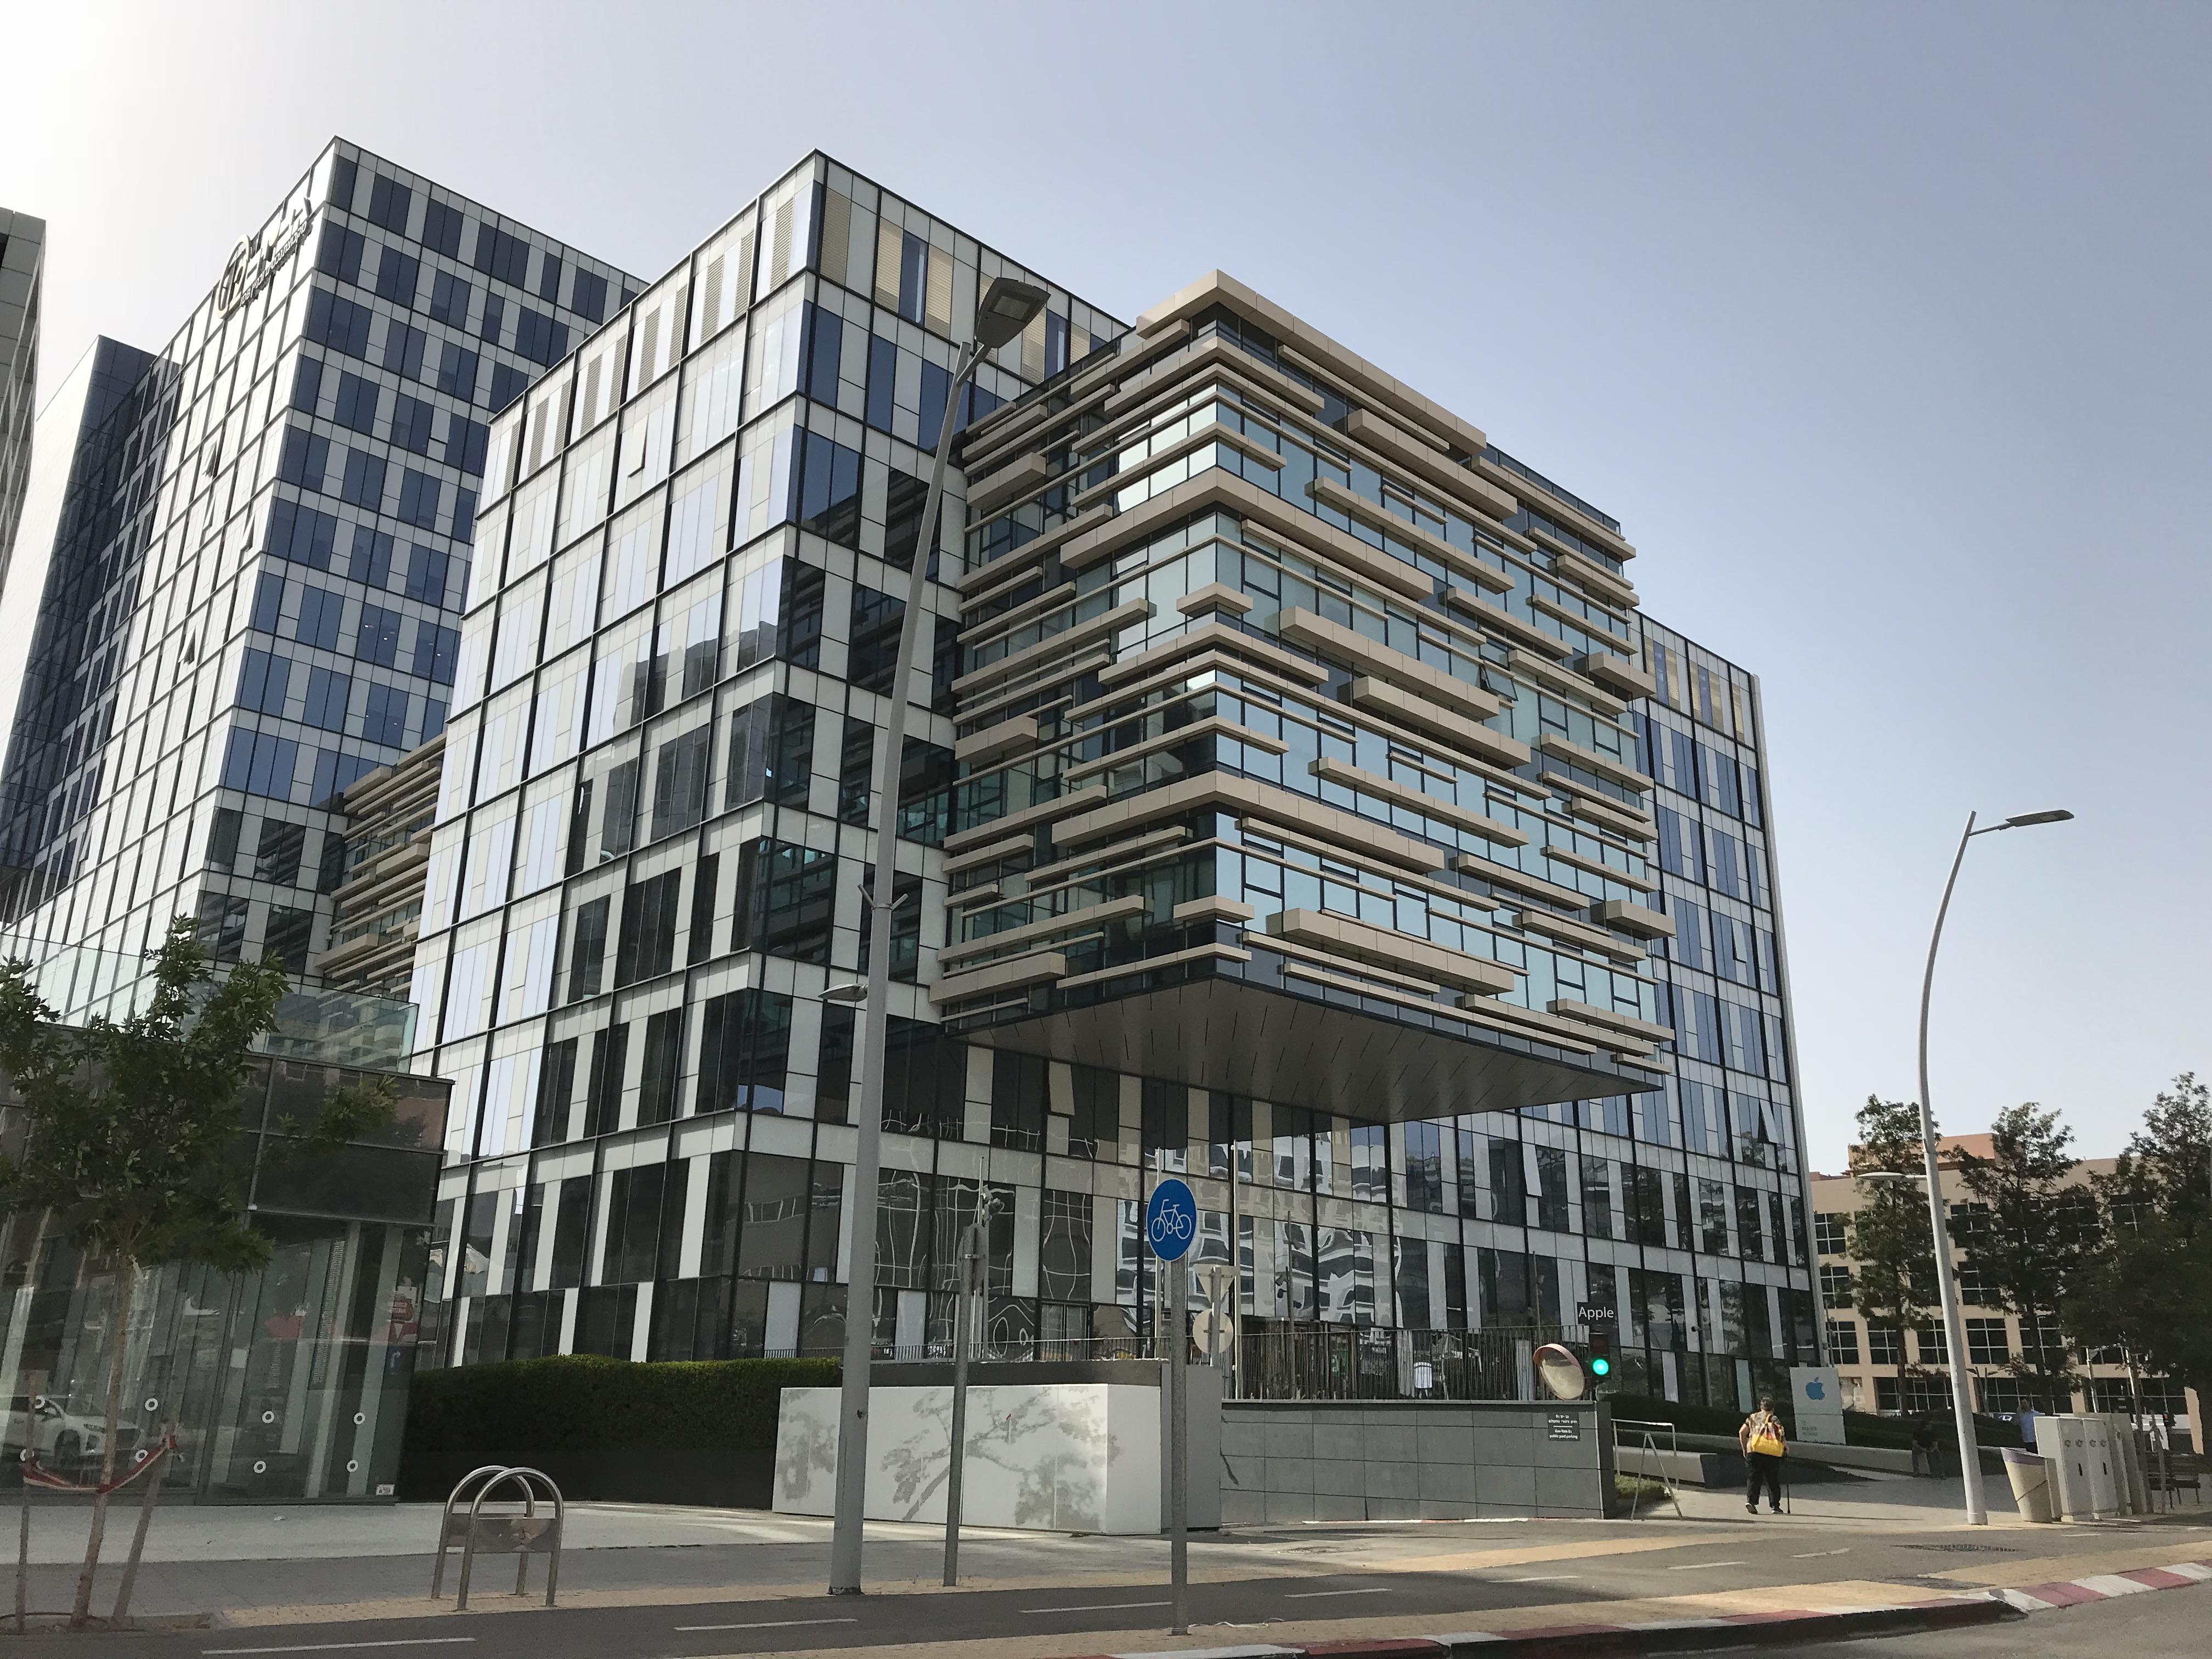 Conteliver Buildings